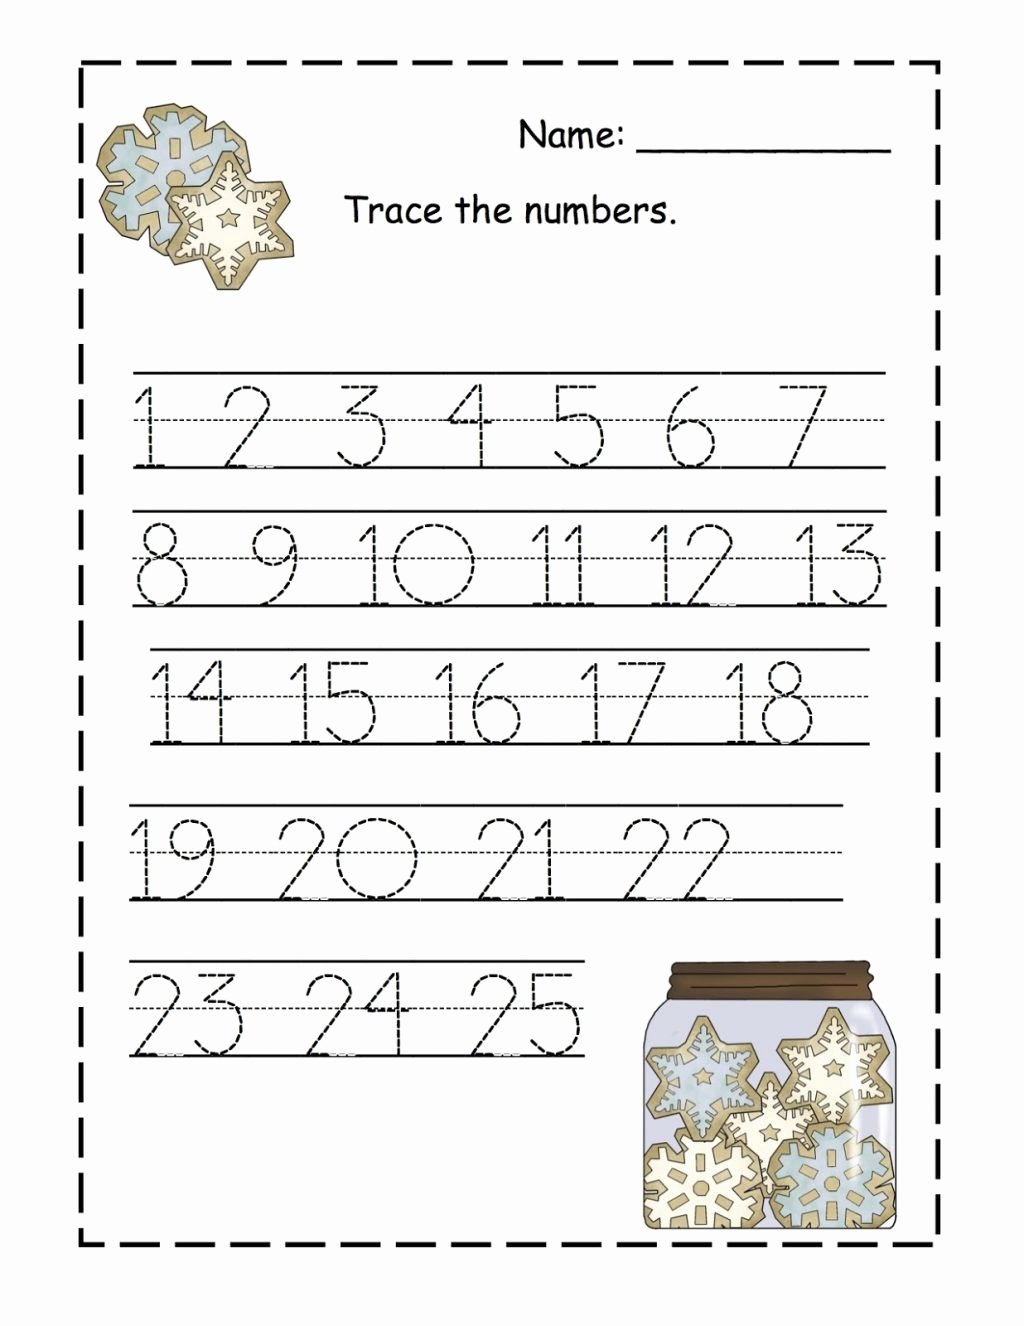 Writing Name Worksheets for Preschoolers Lovely Worksheet Worksheet Preschool Printing Worksheets Fabulous